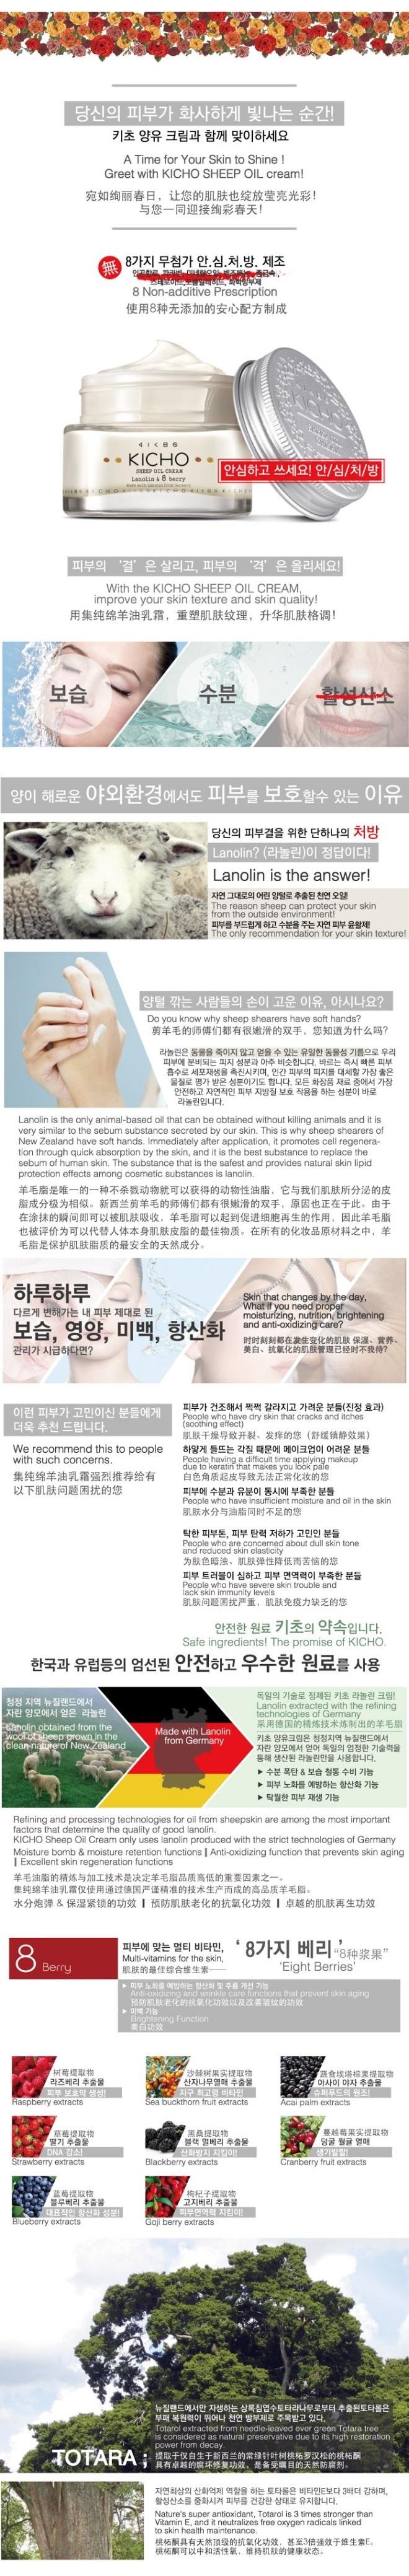 Credit: KICHO Korea website